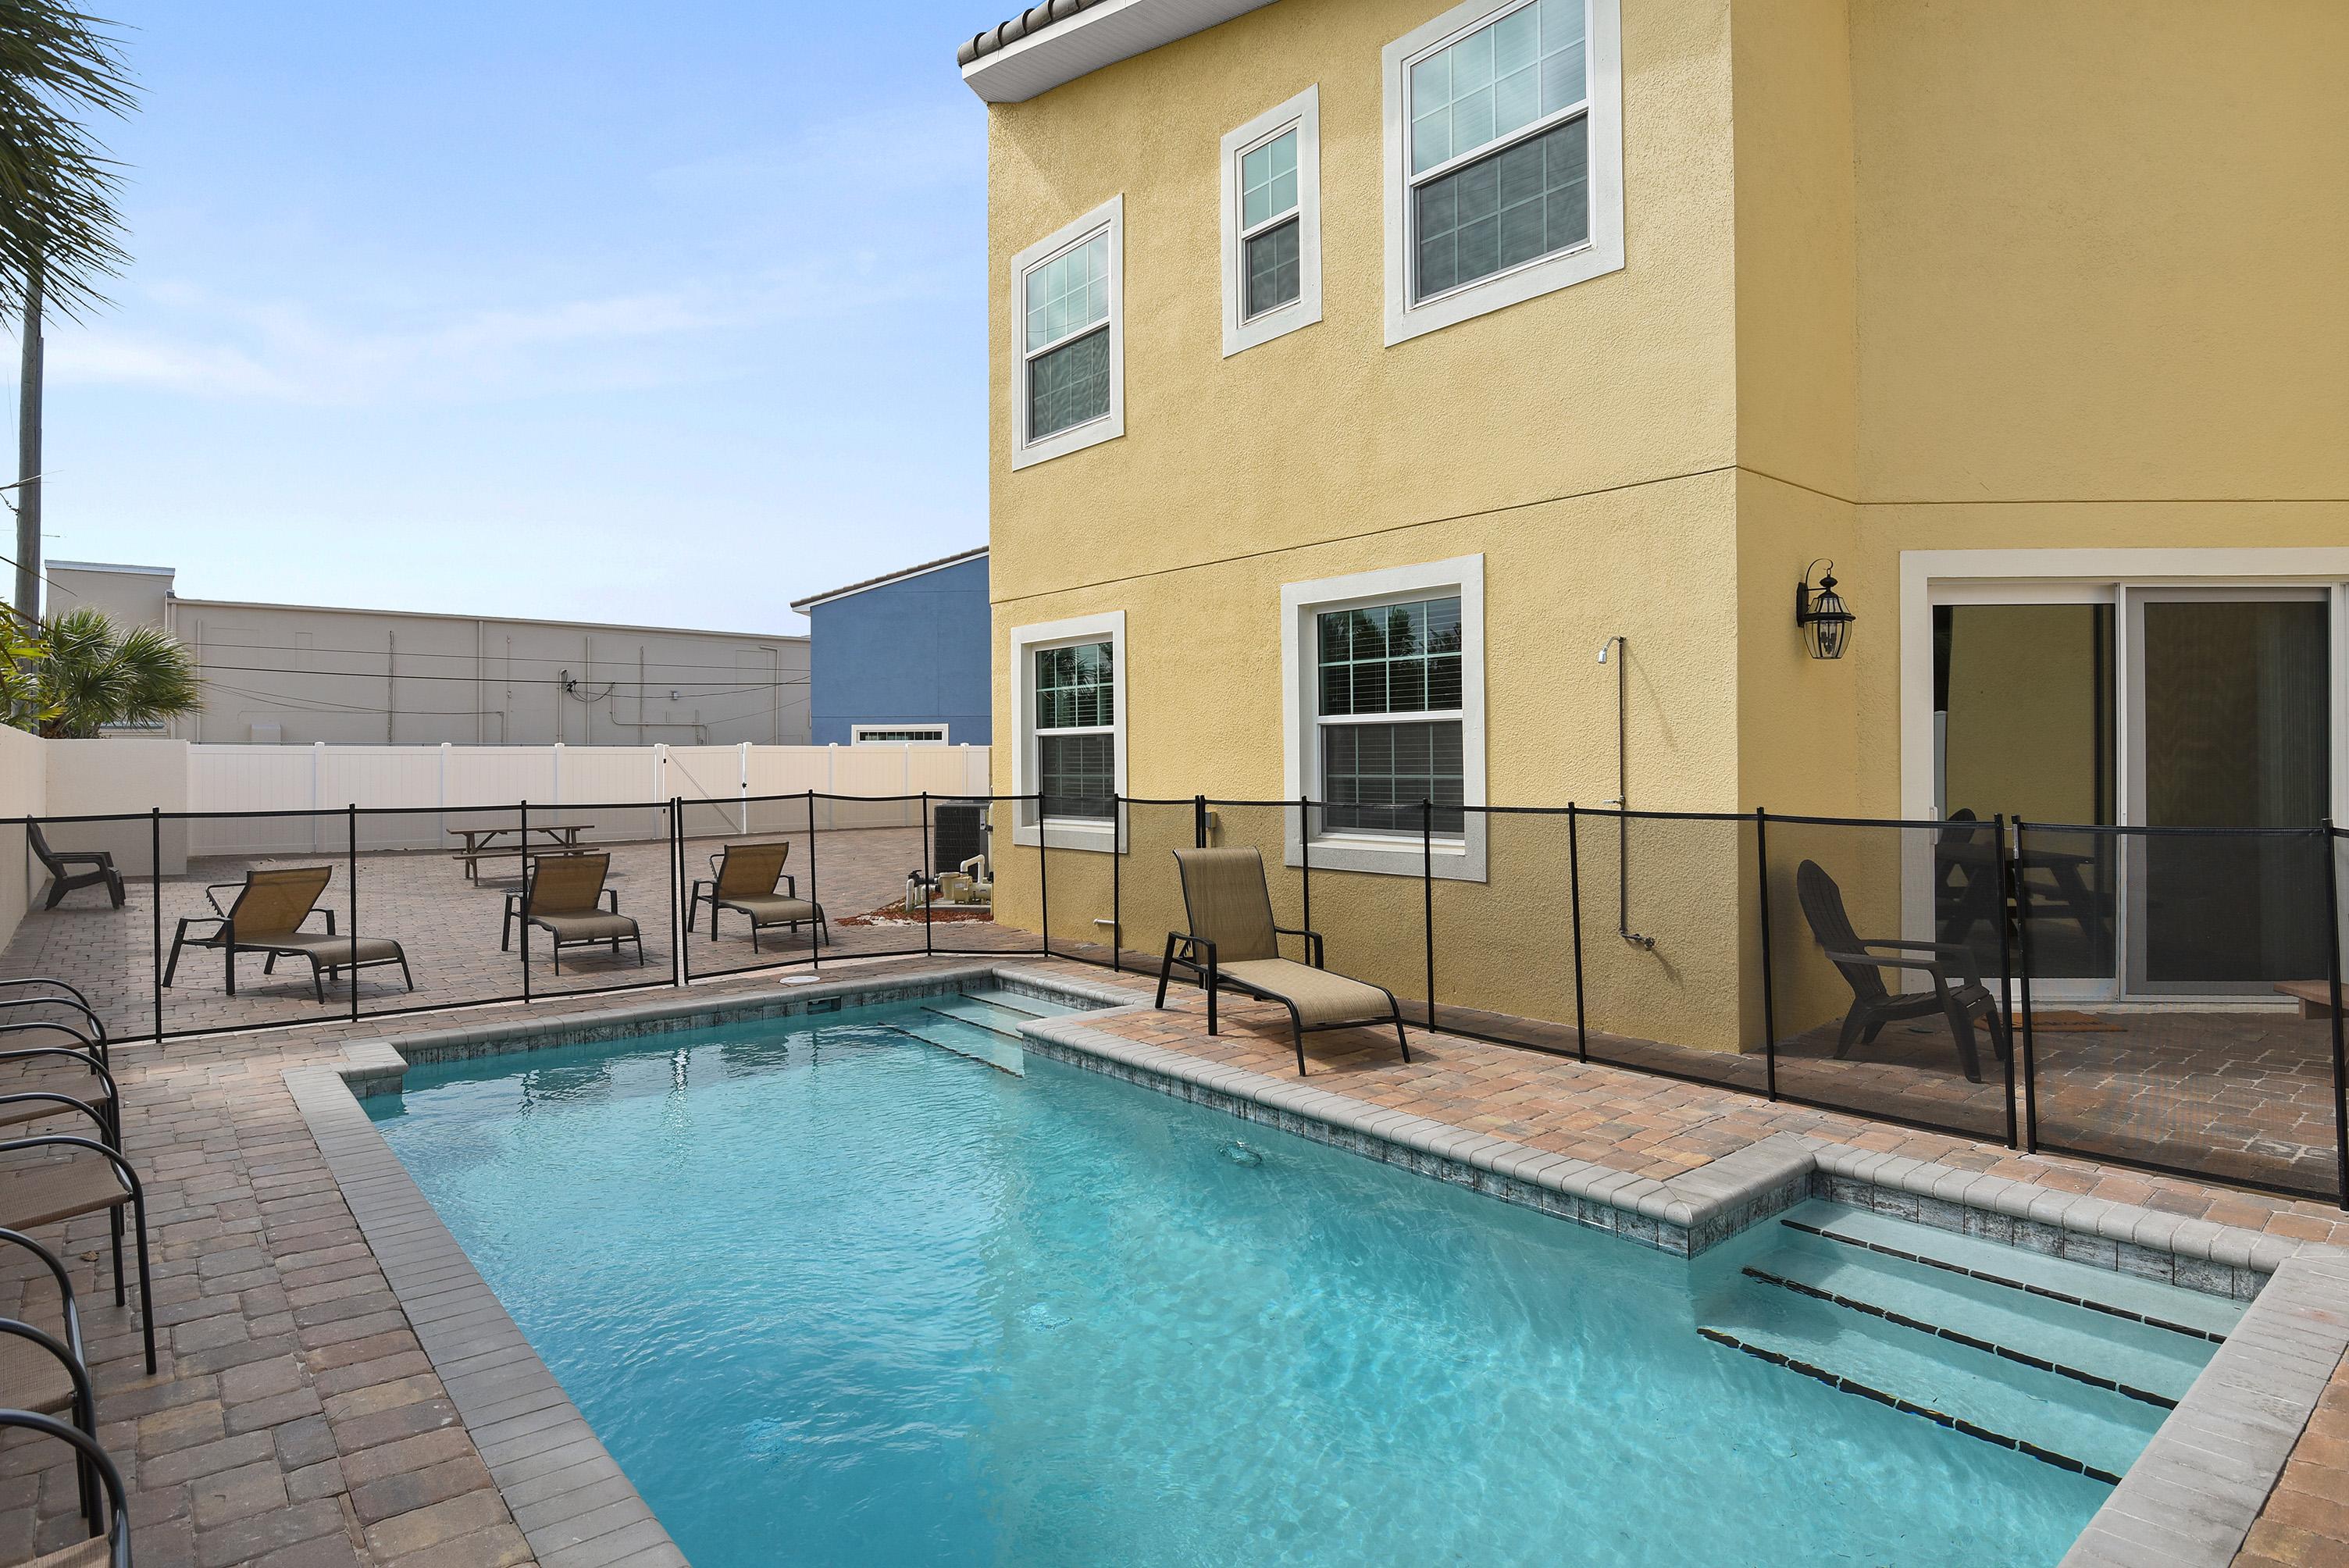 Pool outside of property